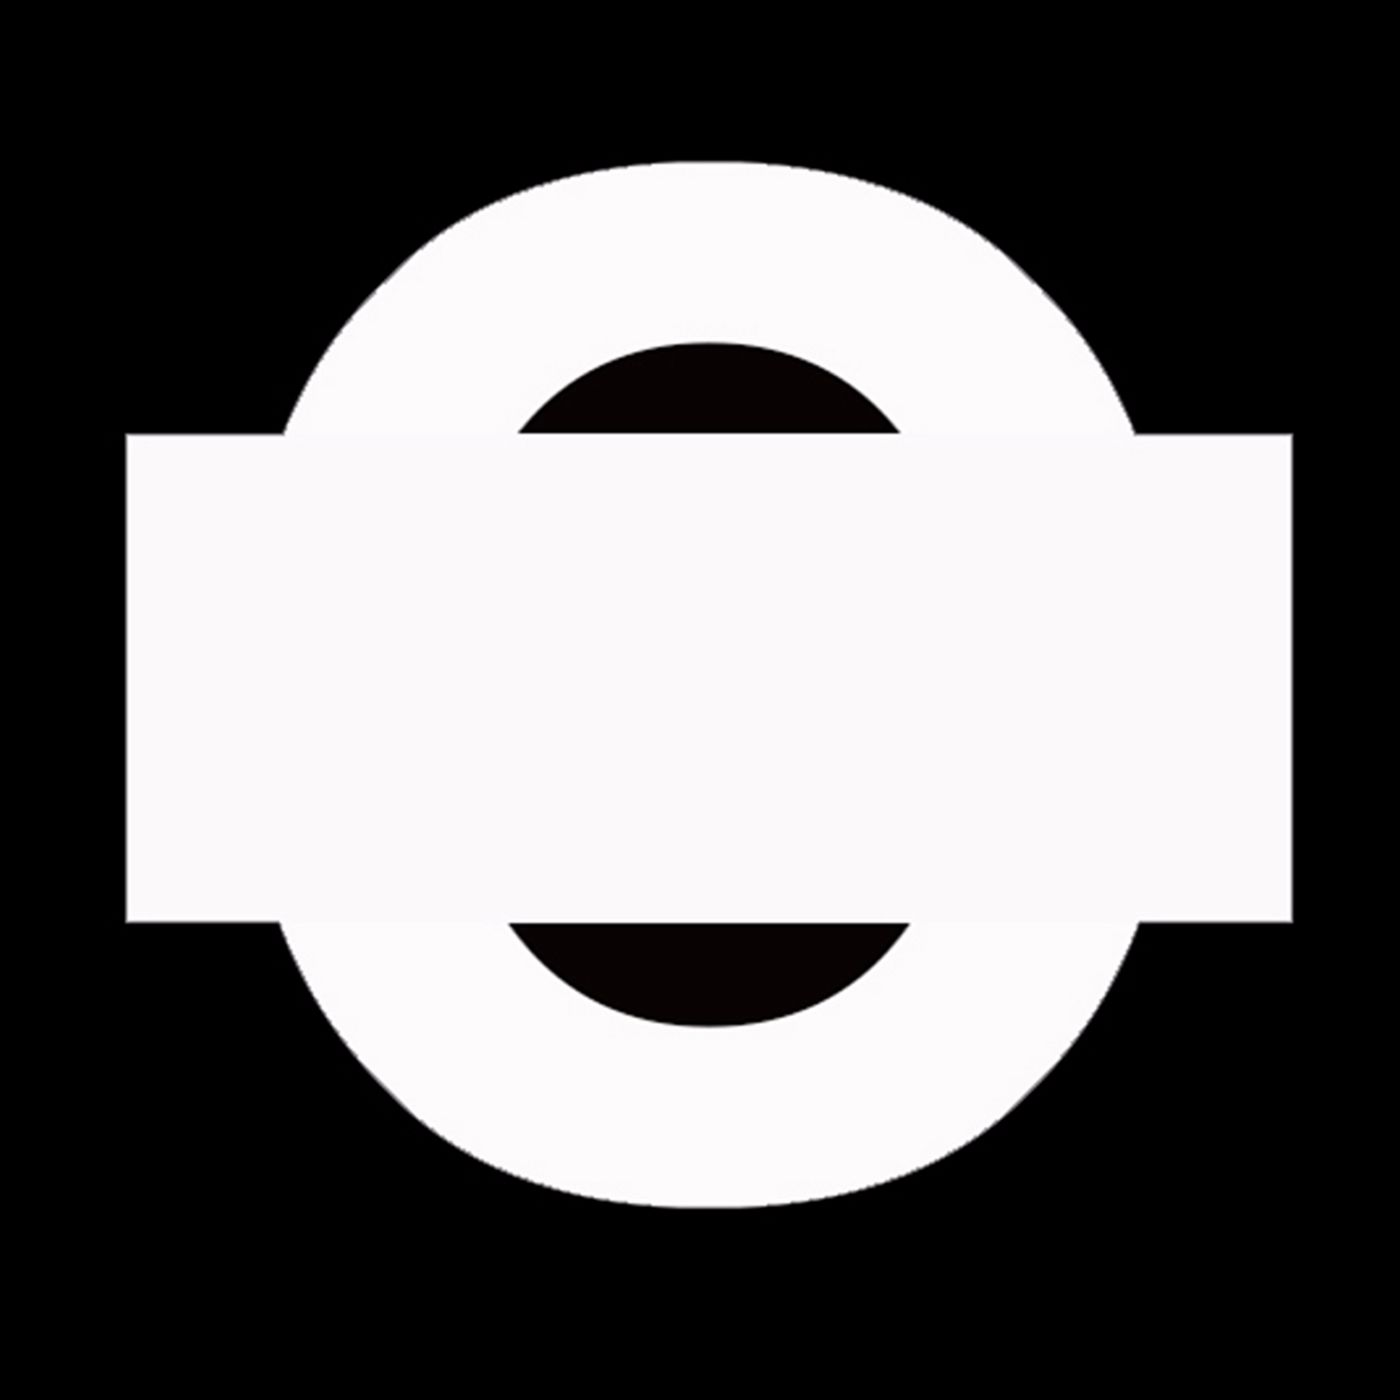 skrillex elliphant mp3 download